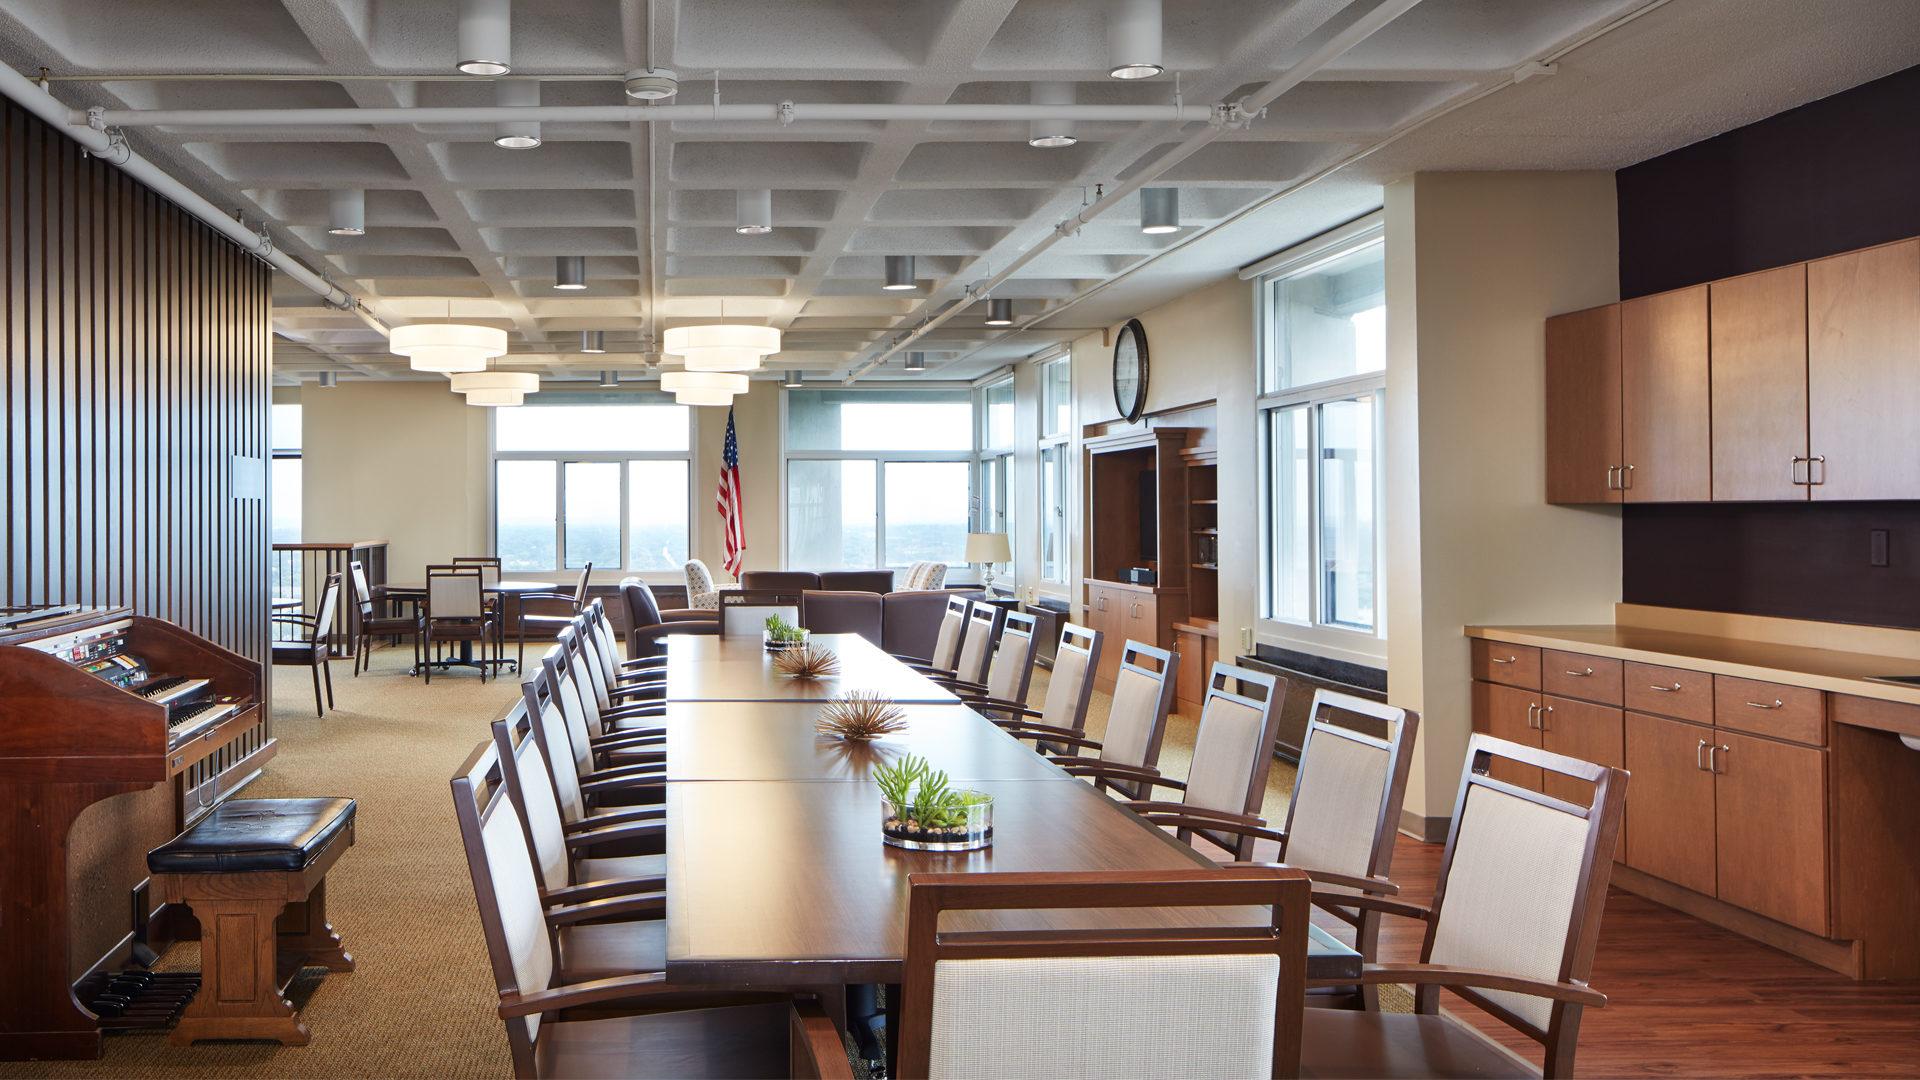 Ebenezer Tower Apartments Interior Dining Room